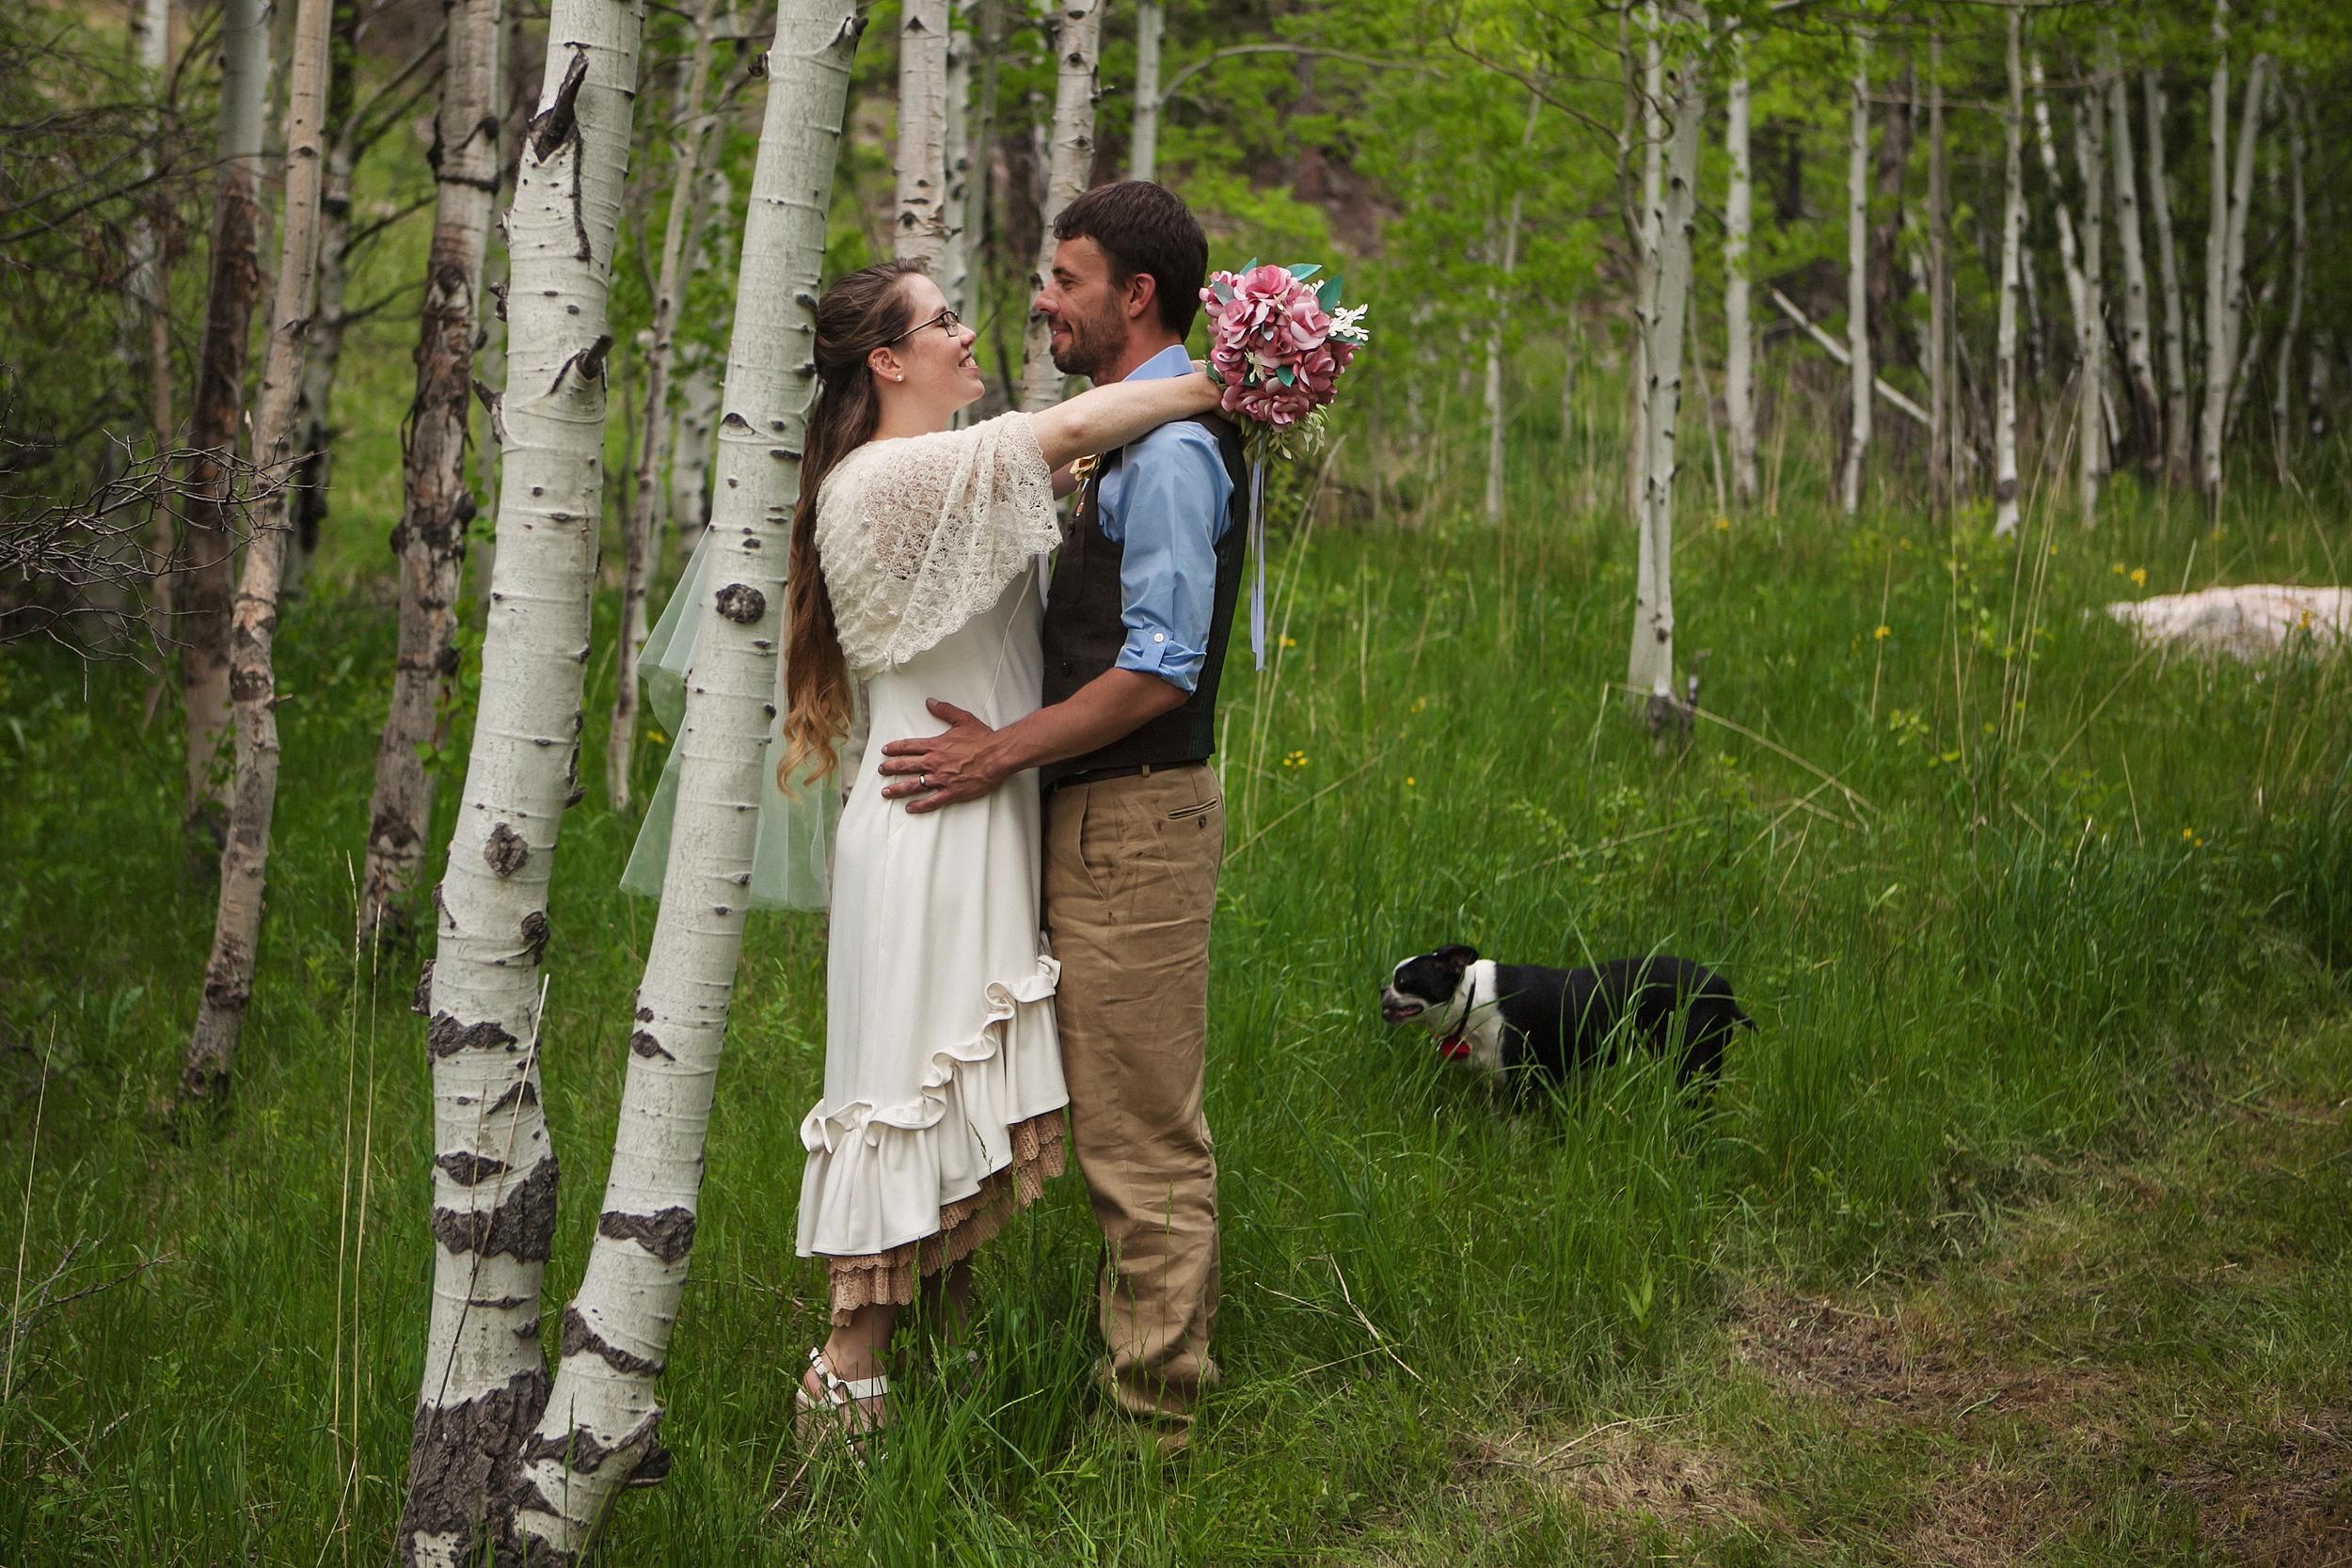 All photos courtesy of   Amanda Tipton  |  Kokoro Wedding Photography